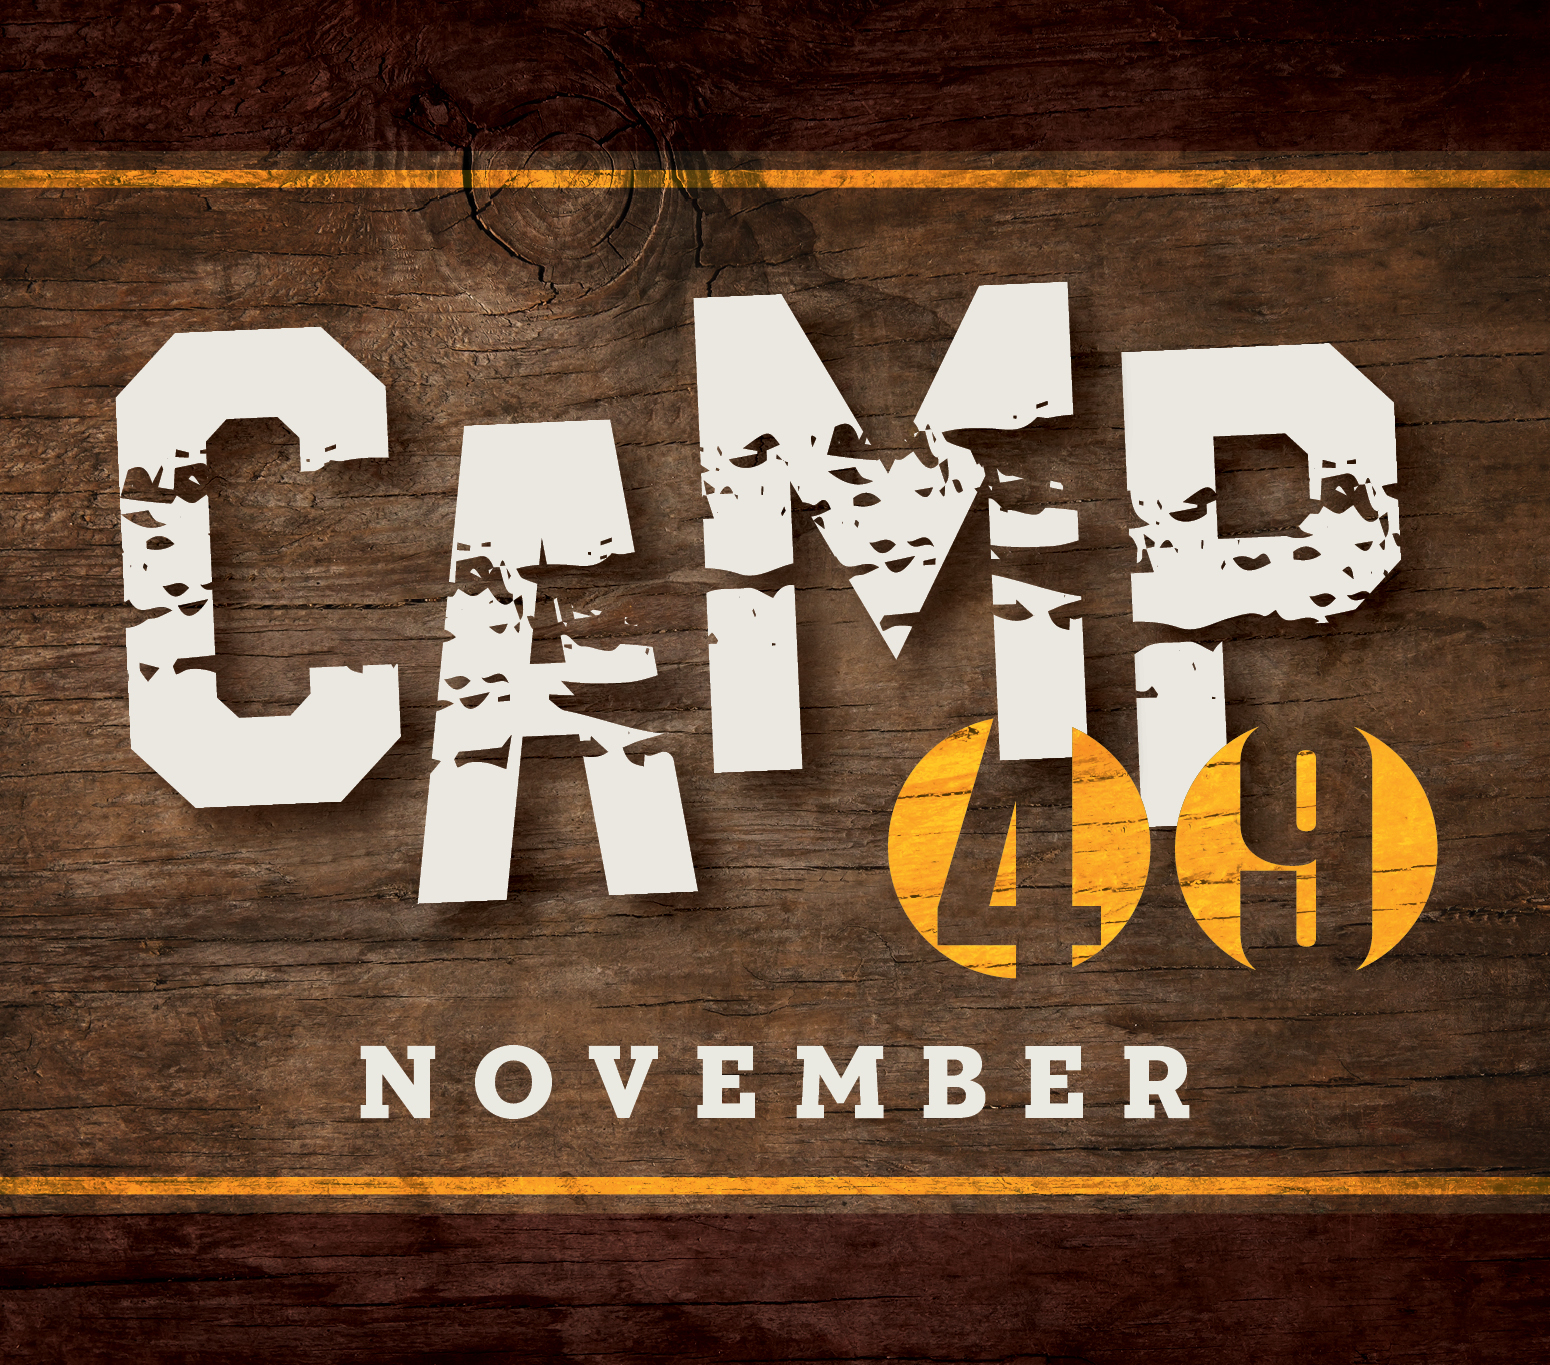 Camp 49 - November